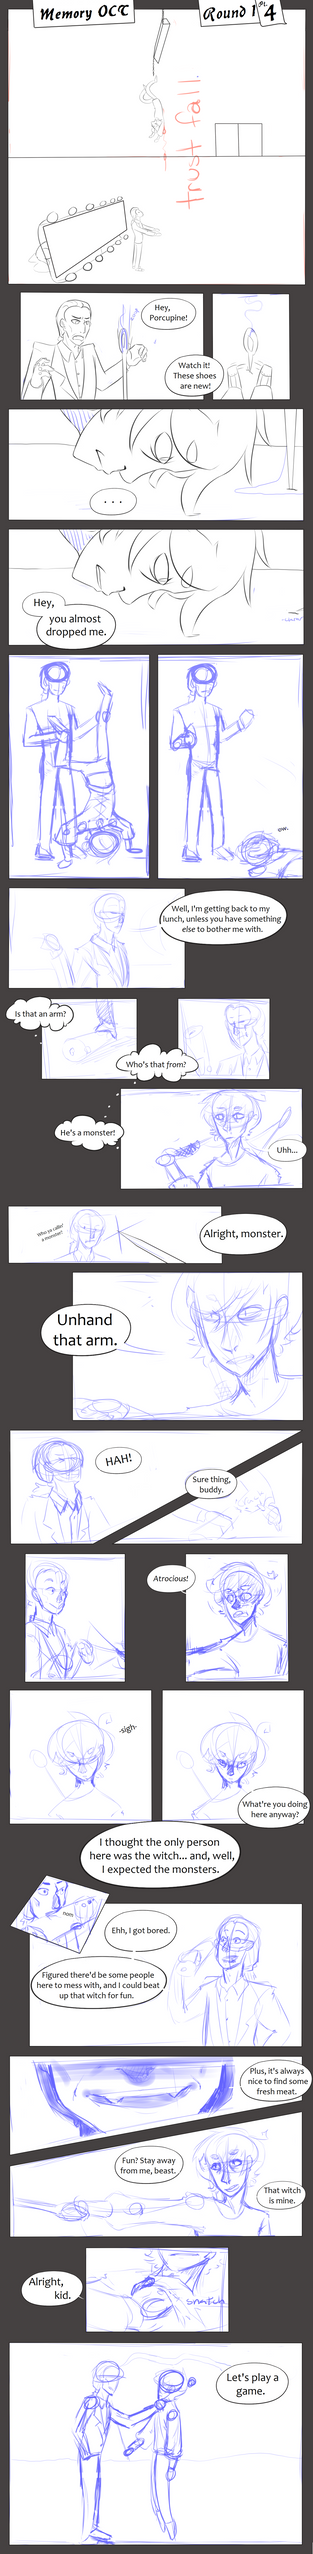 Memory OCT Round 1: Ichabod vs. Walter (4) by PhoenixTea